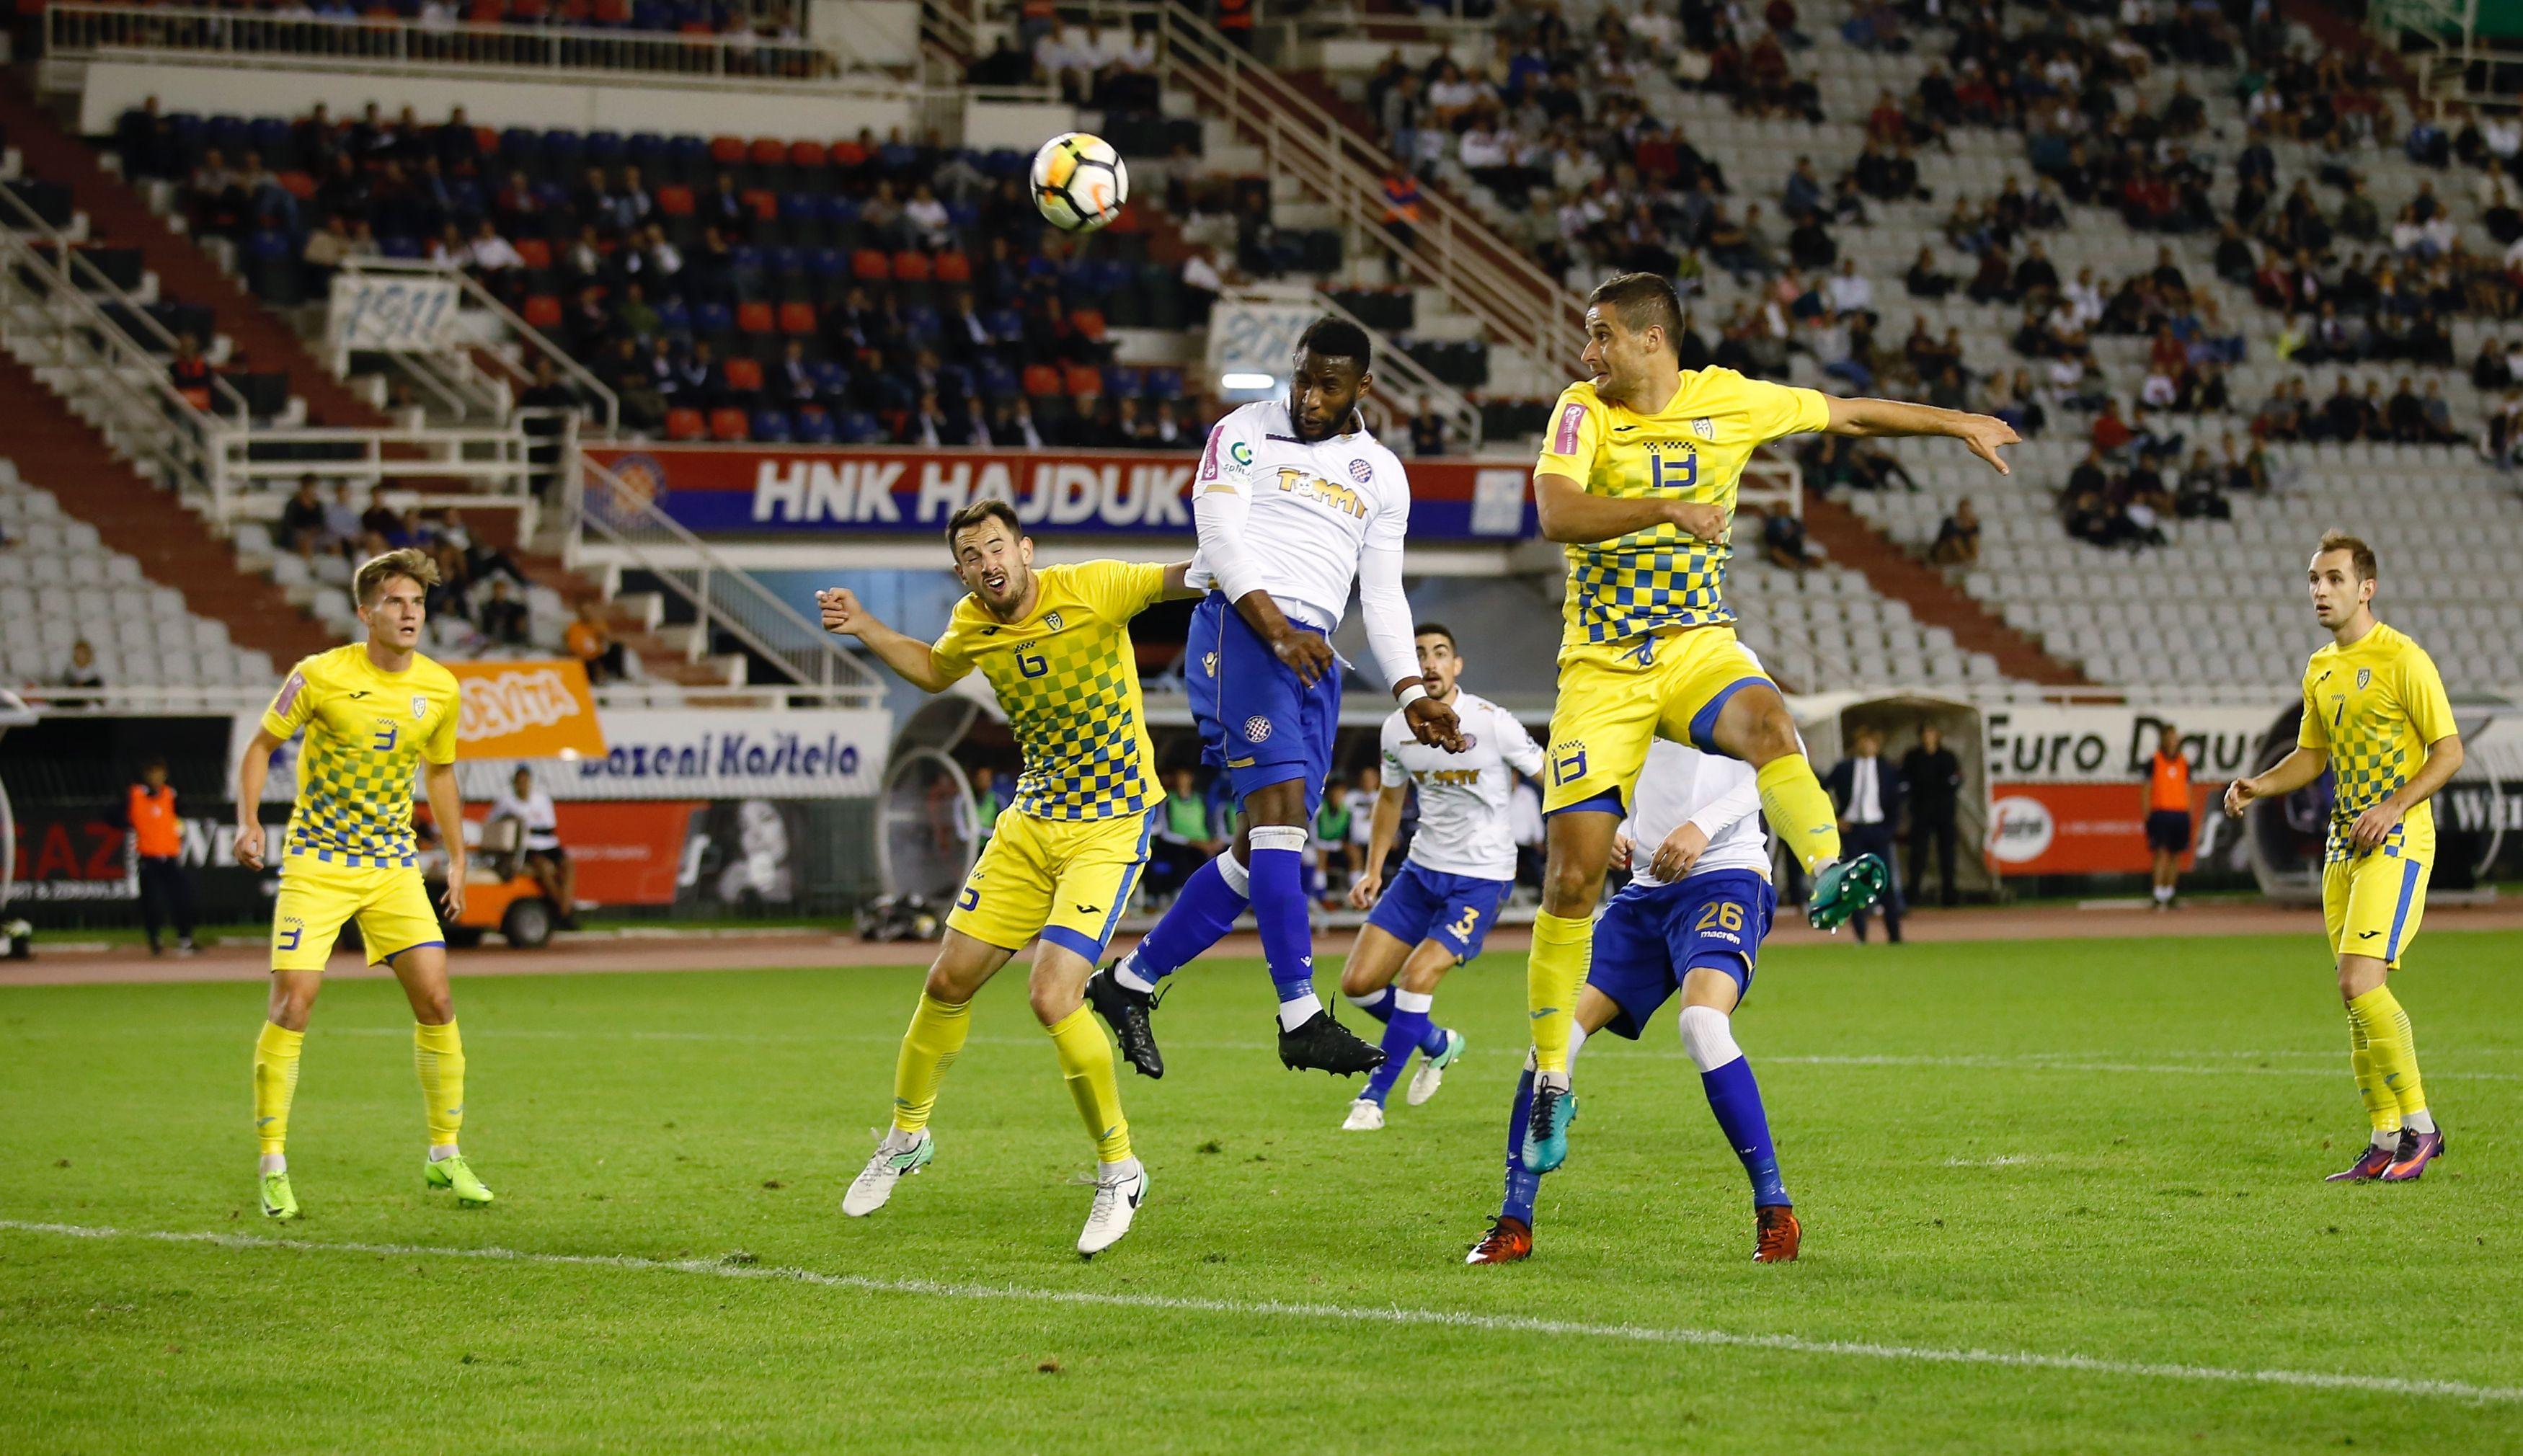 HNL Hajduk – Inter 2-0